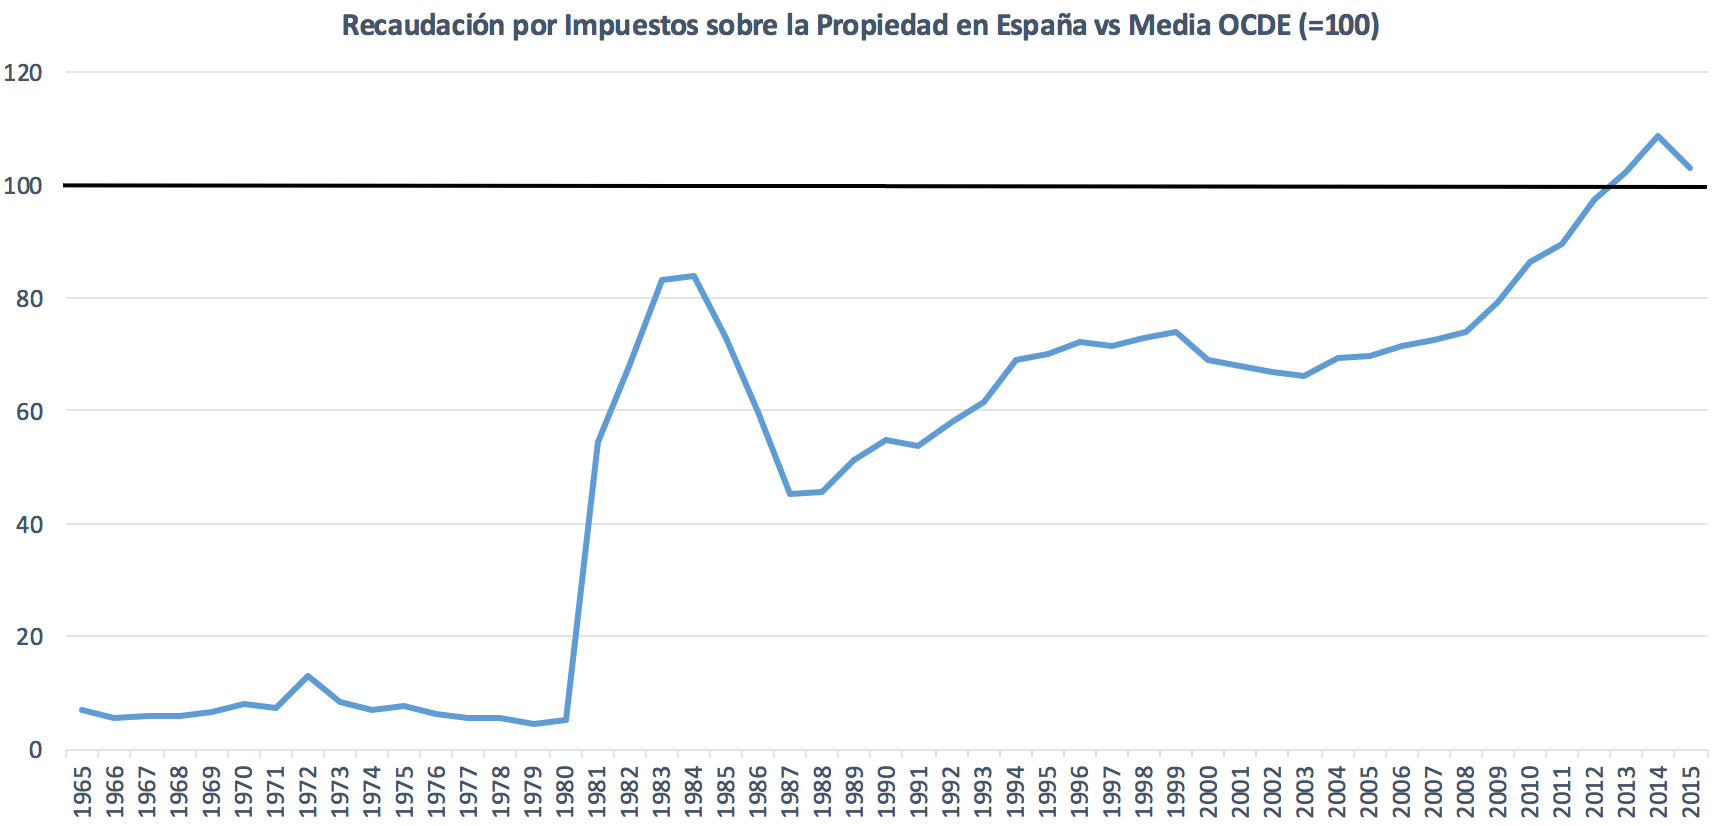 2-Recaudacion-IBI-Espana-OCDE.png